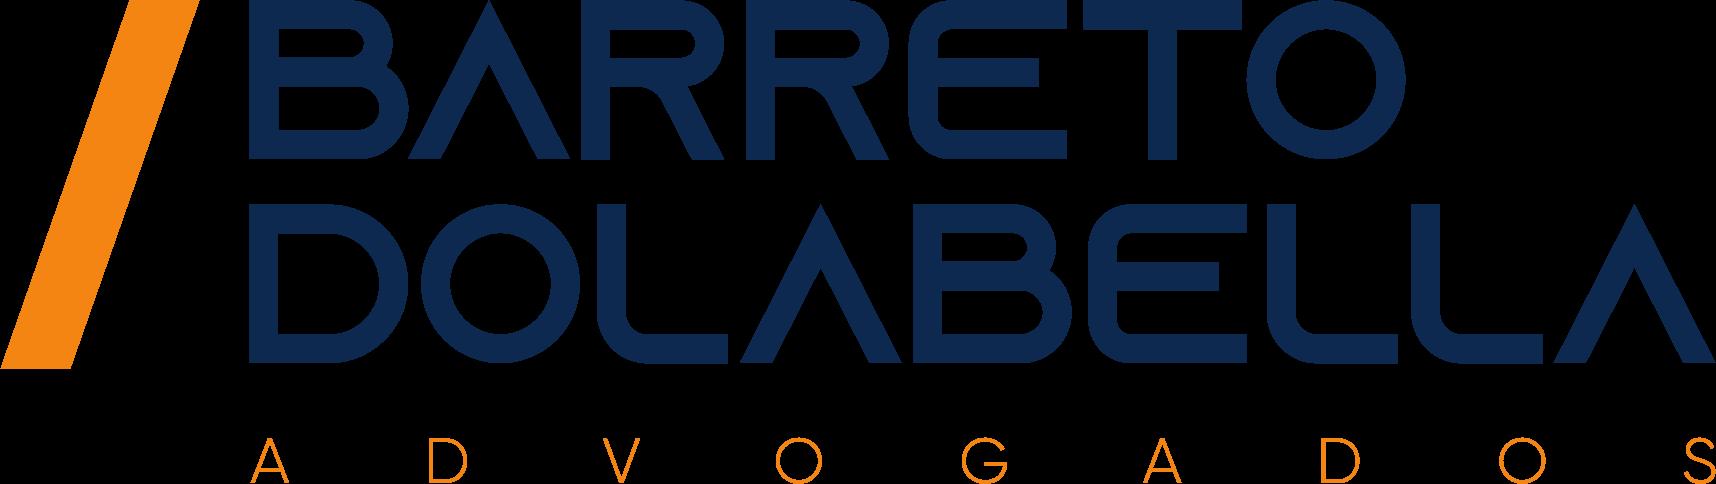 https://barretodolabella.com.br/wp-content/uploads/2021/01/logotipo.png